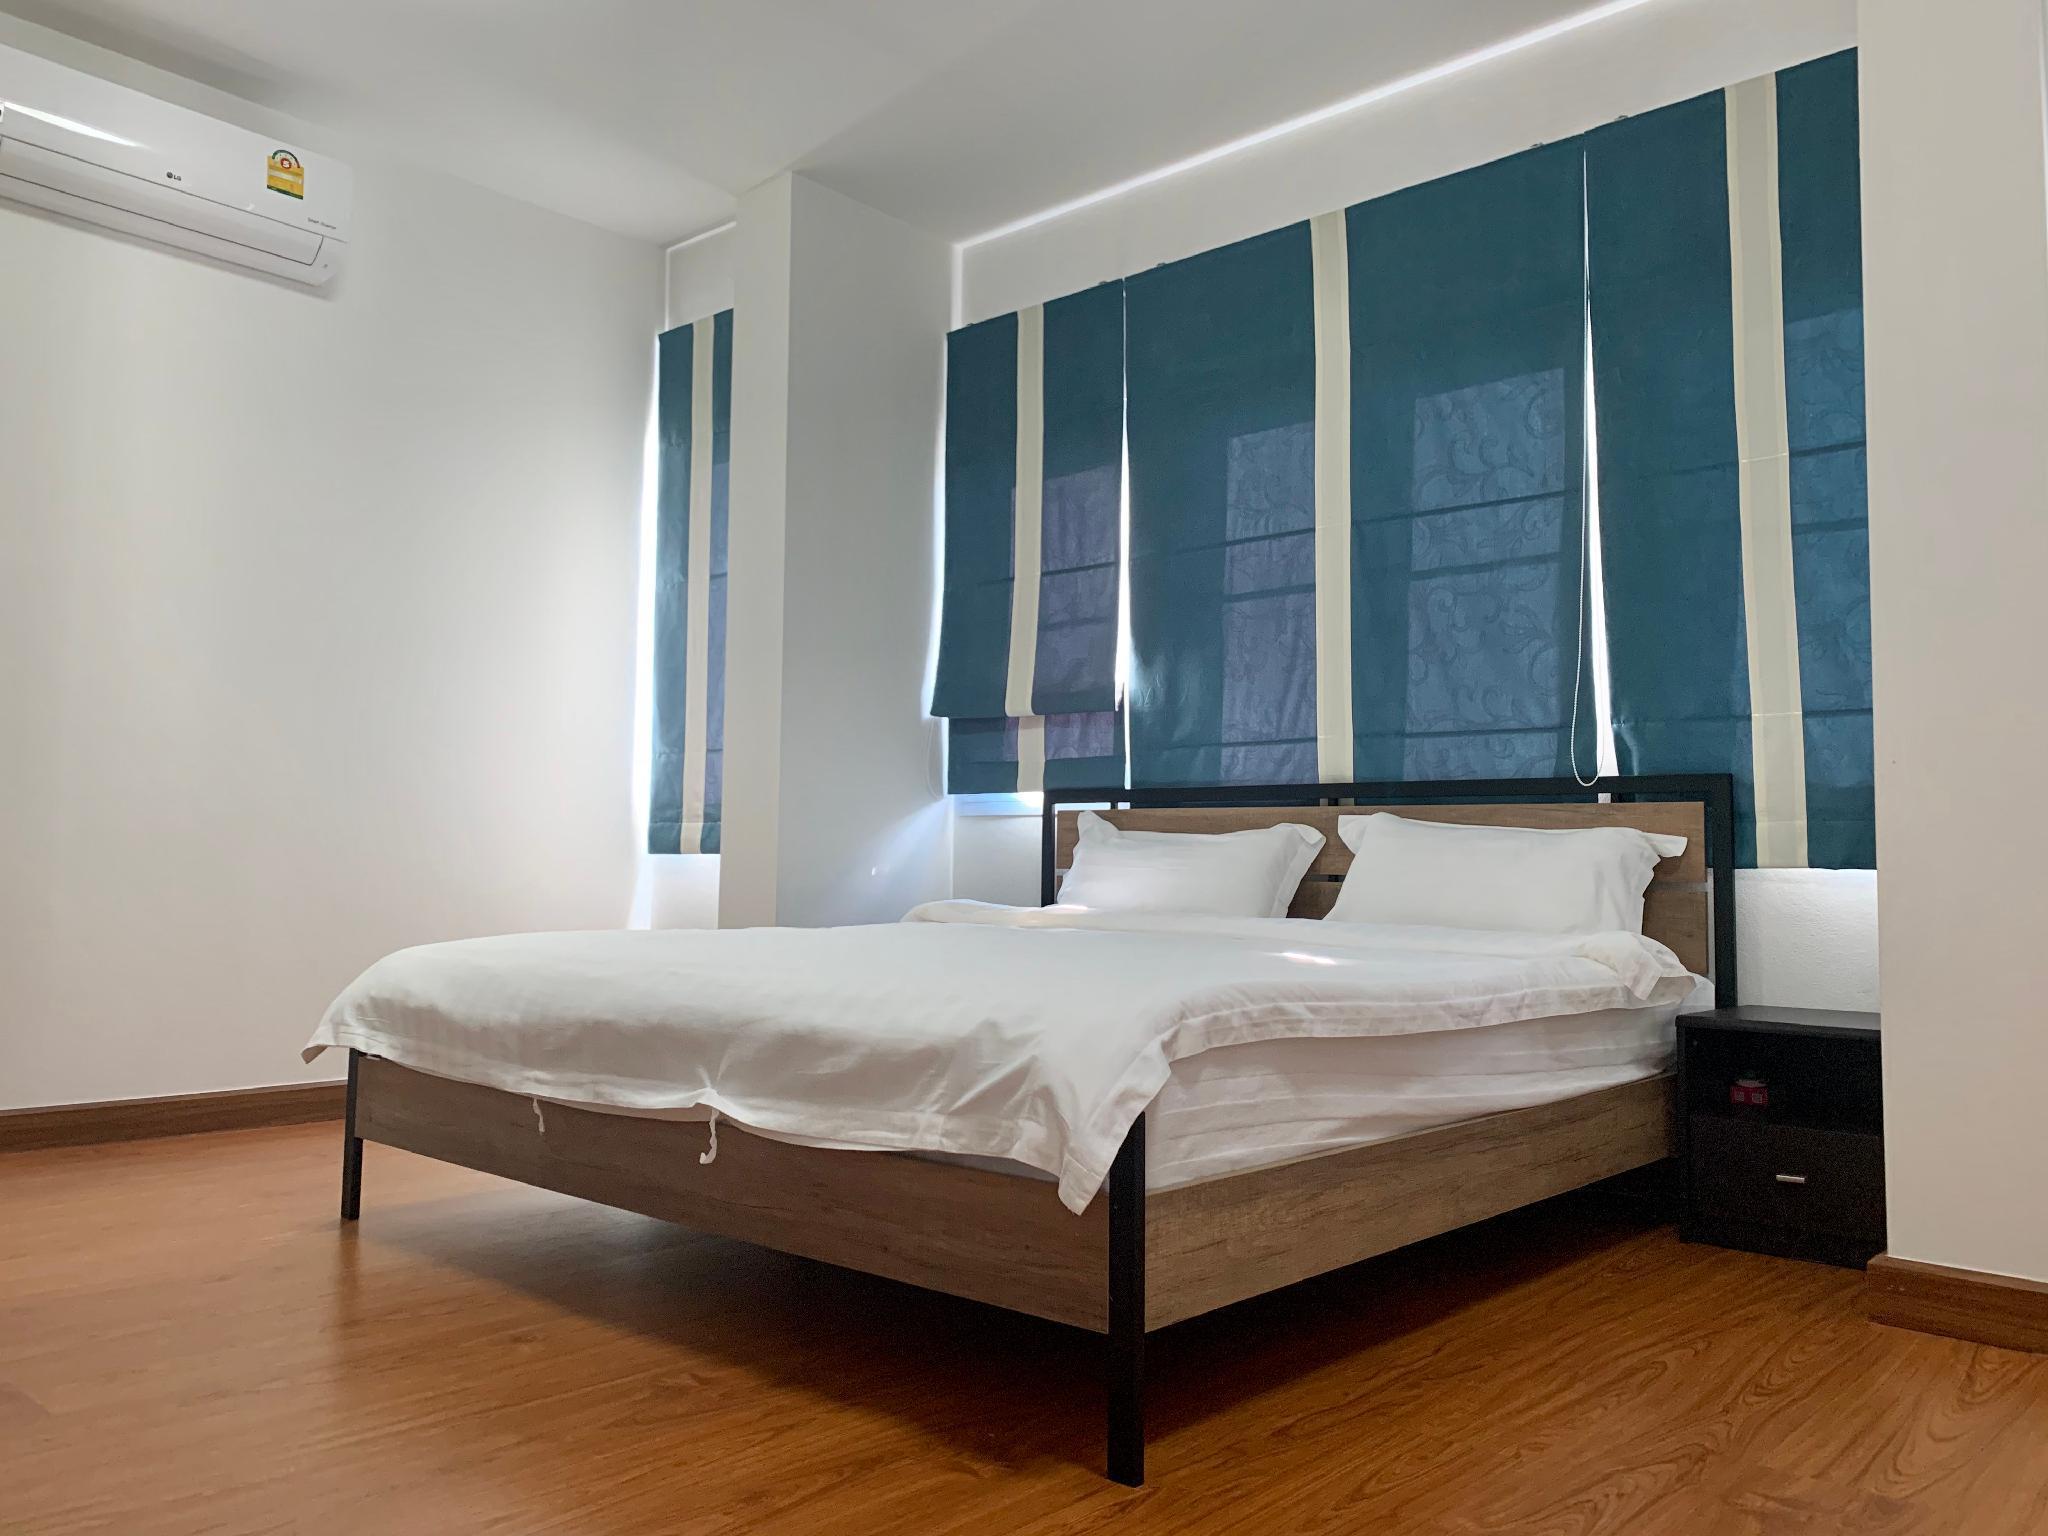 Enjoyable and Quiet Jinbei Villa 233 3 ห้องนอน 3 ห้องน้ำส่วนตัว ขนาด 130 ตร.ม. – เขตเมืองเก่า